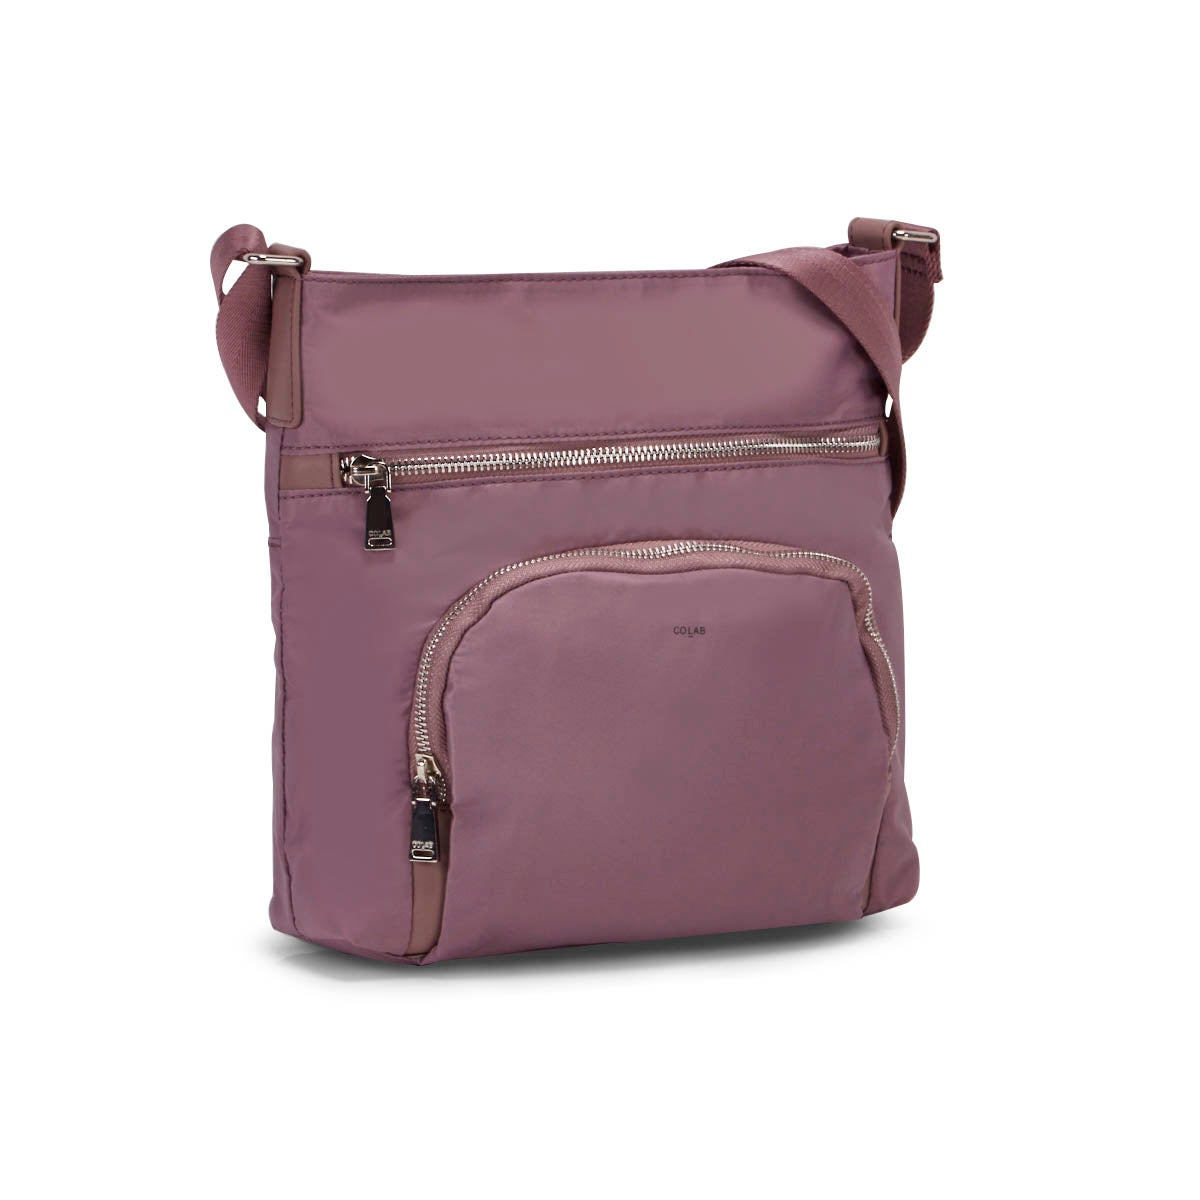 Lds mauve medium top zip crossbody bag